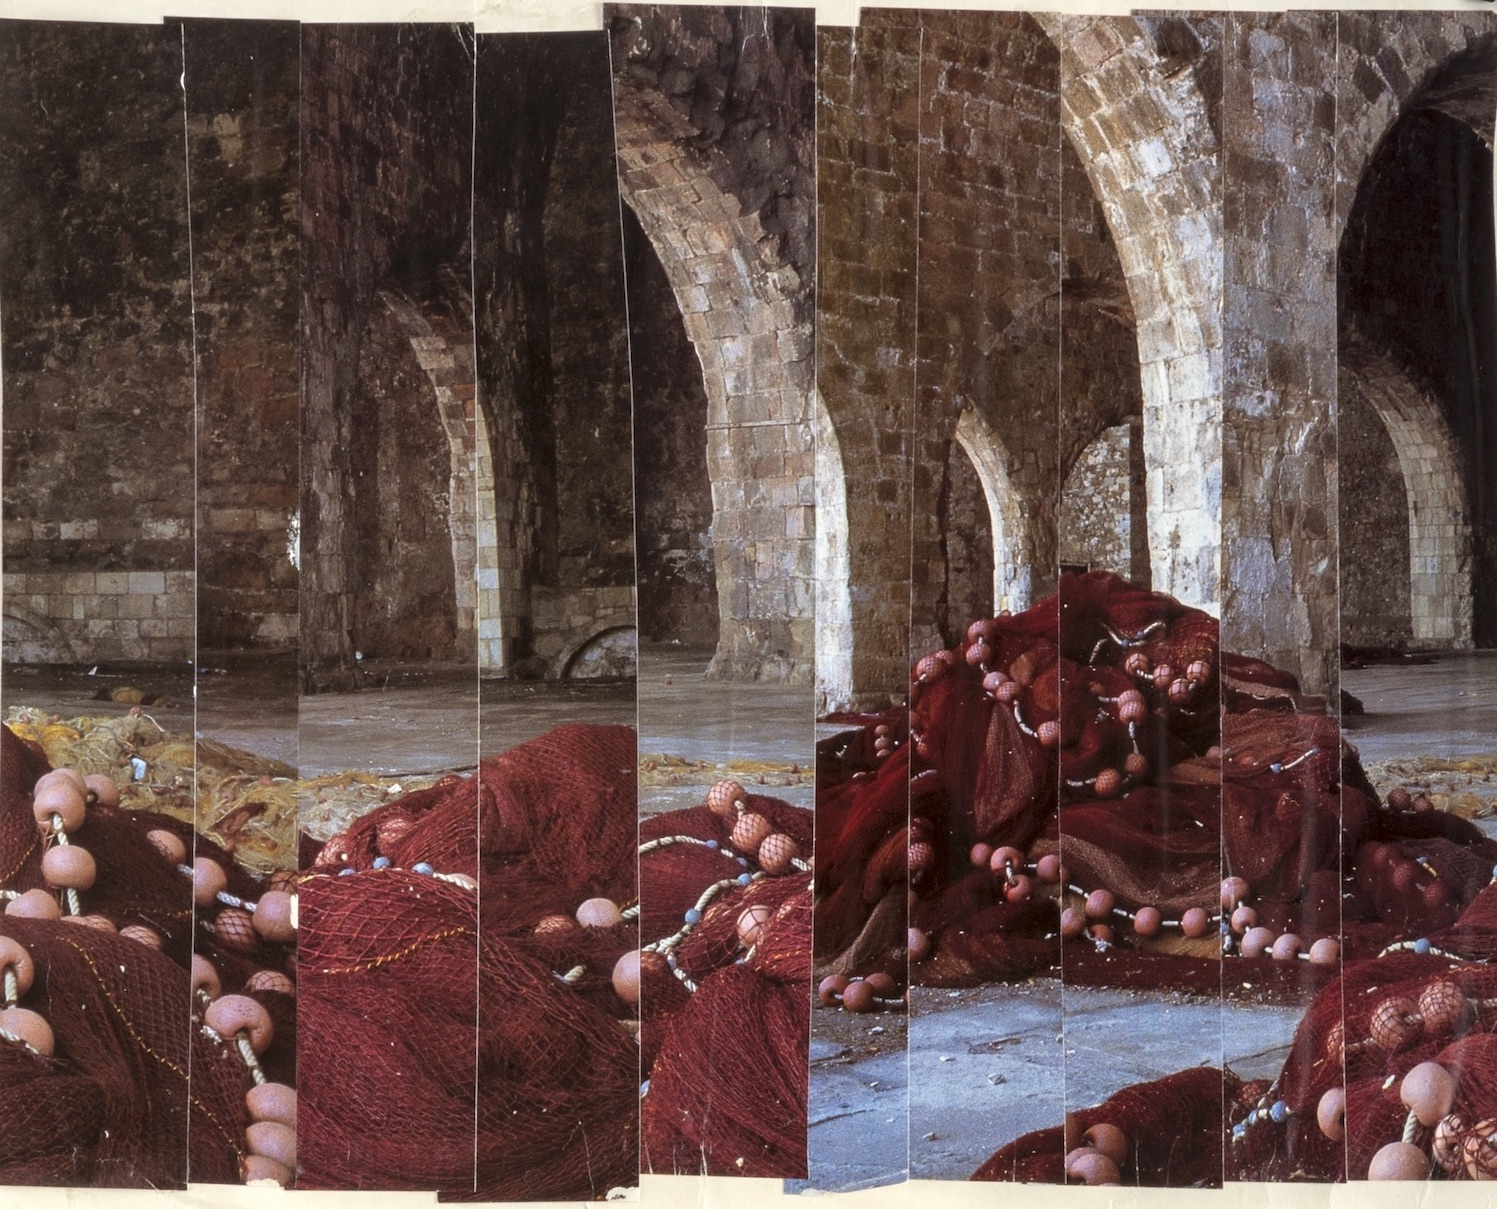 Miki Okamura Landscape Series No. S03-18